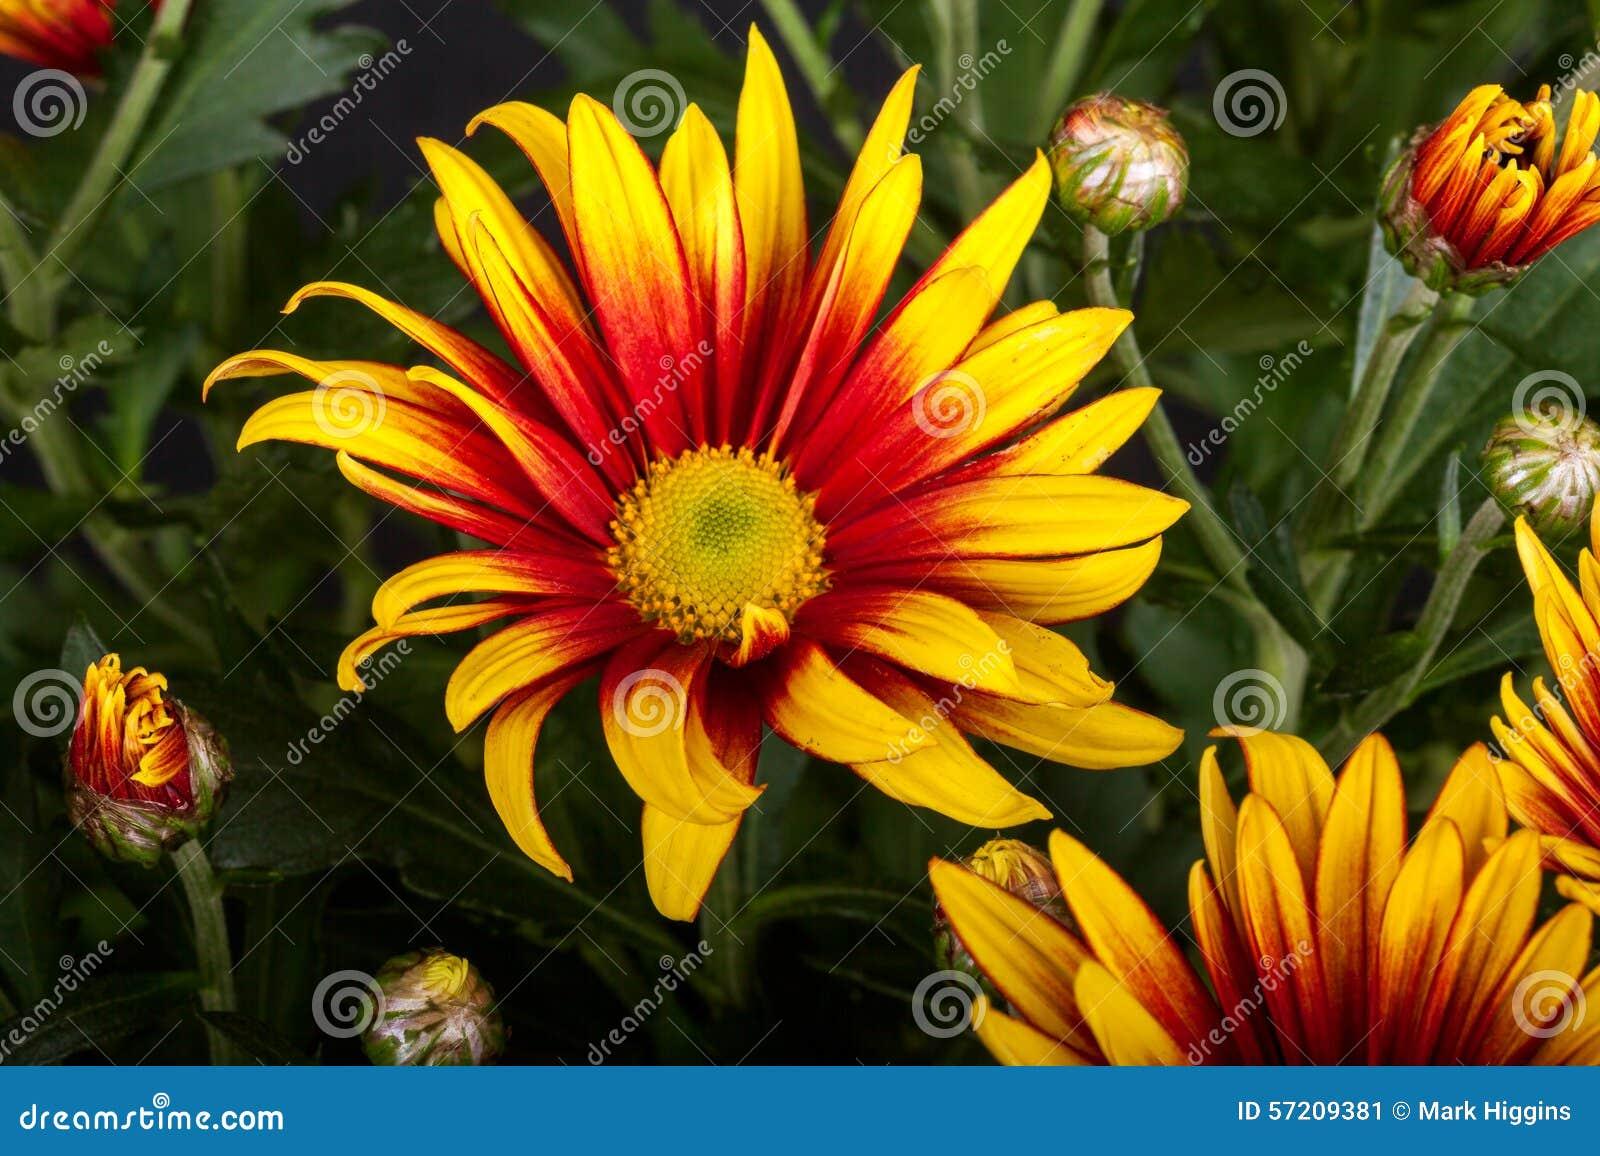 Yellow gazania daisy stock image. Image of color, aster - 57209381